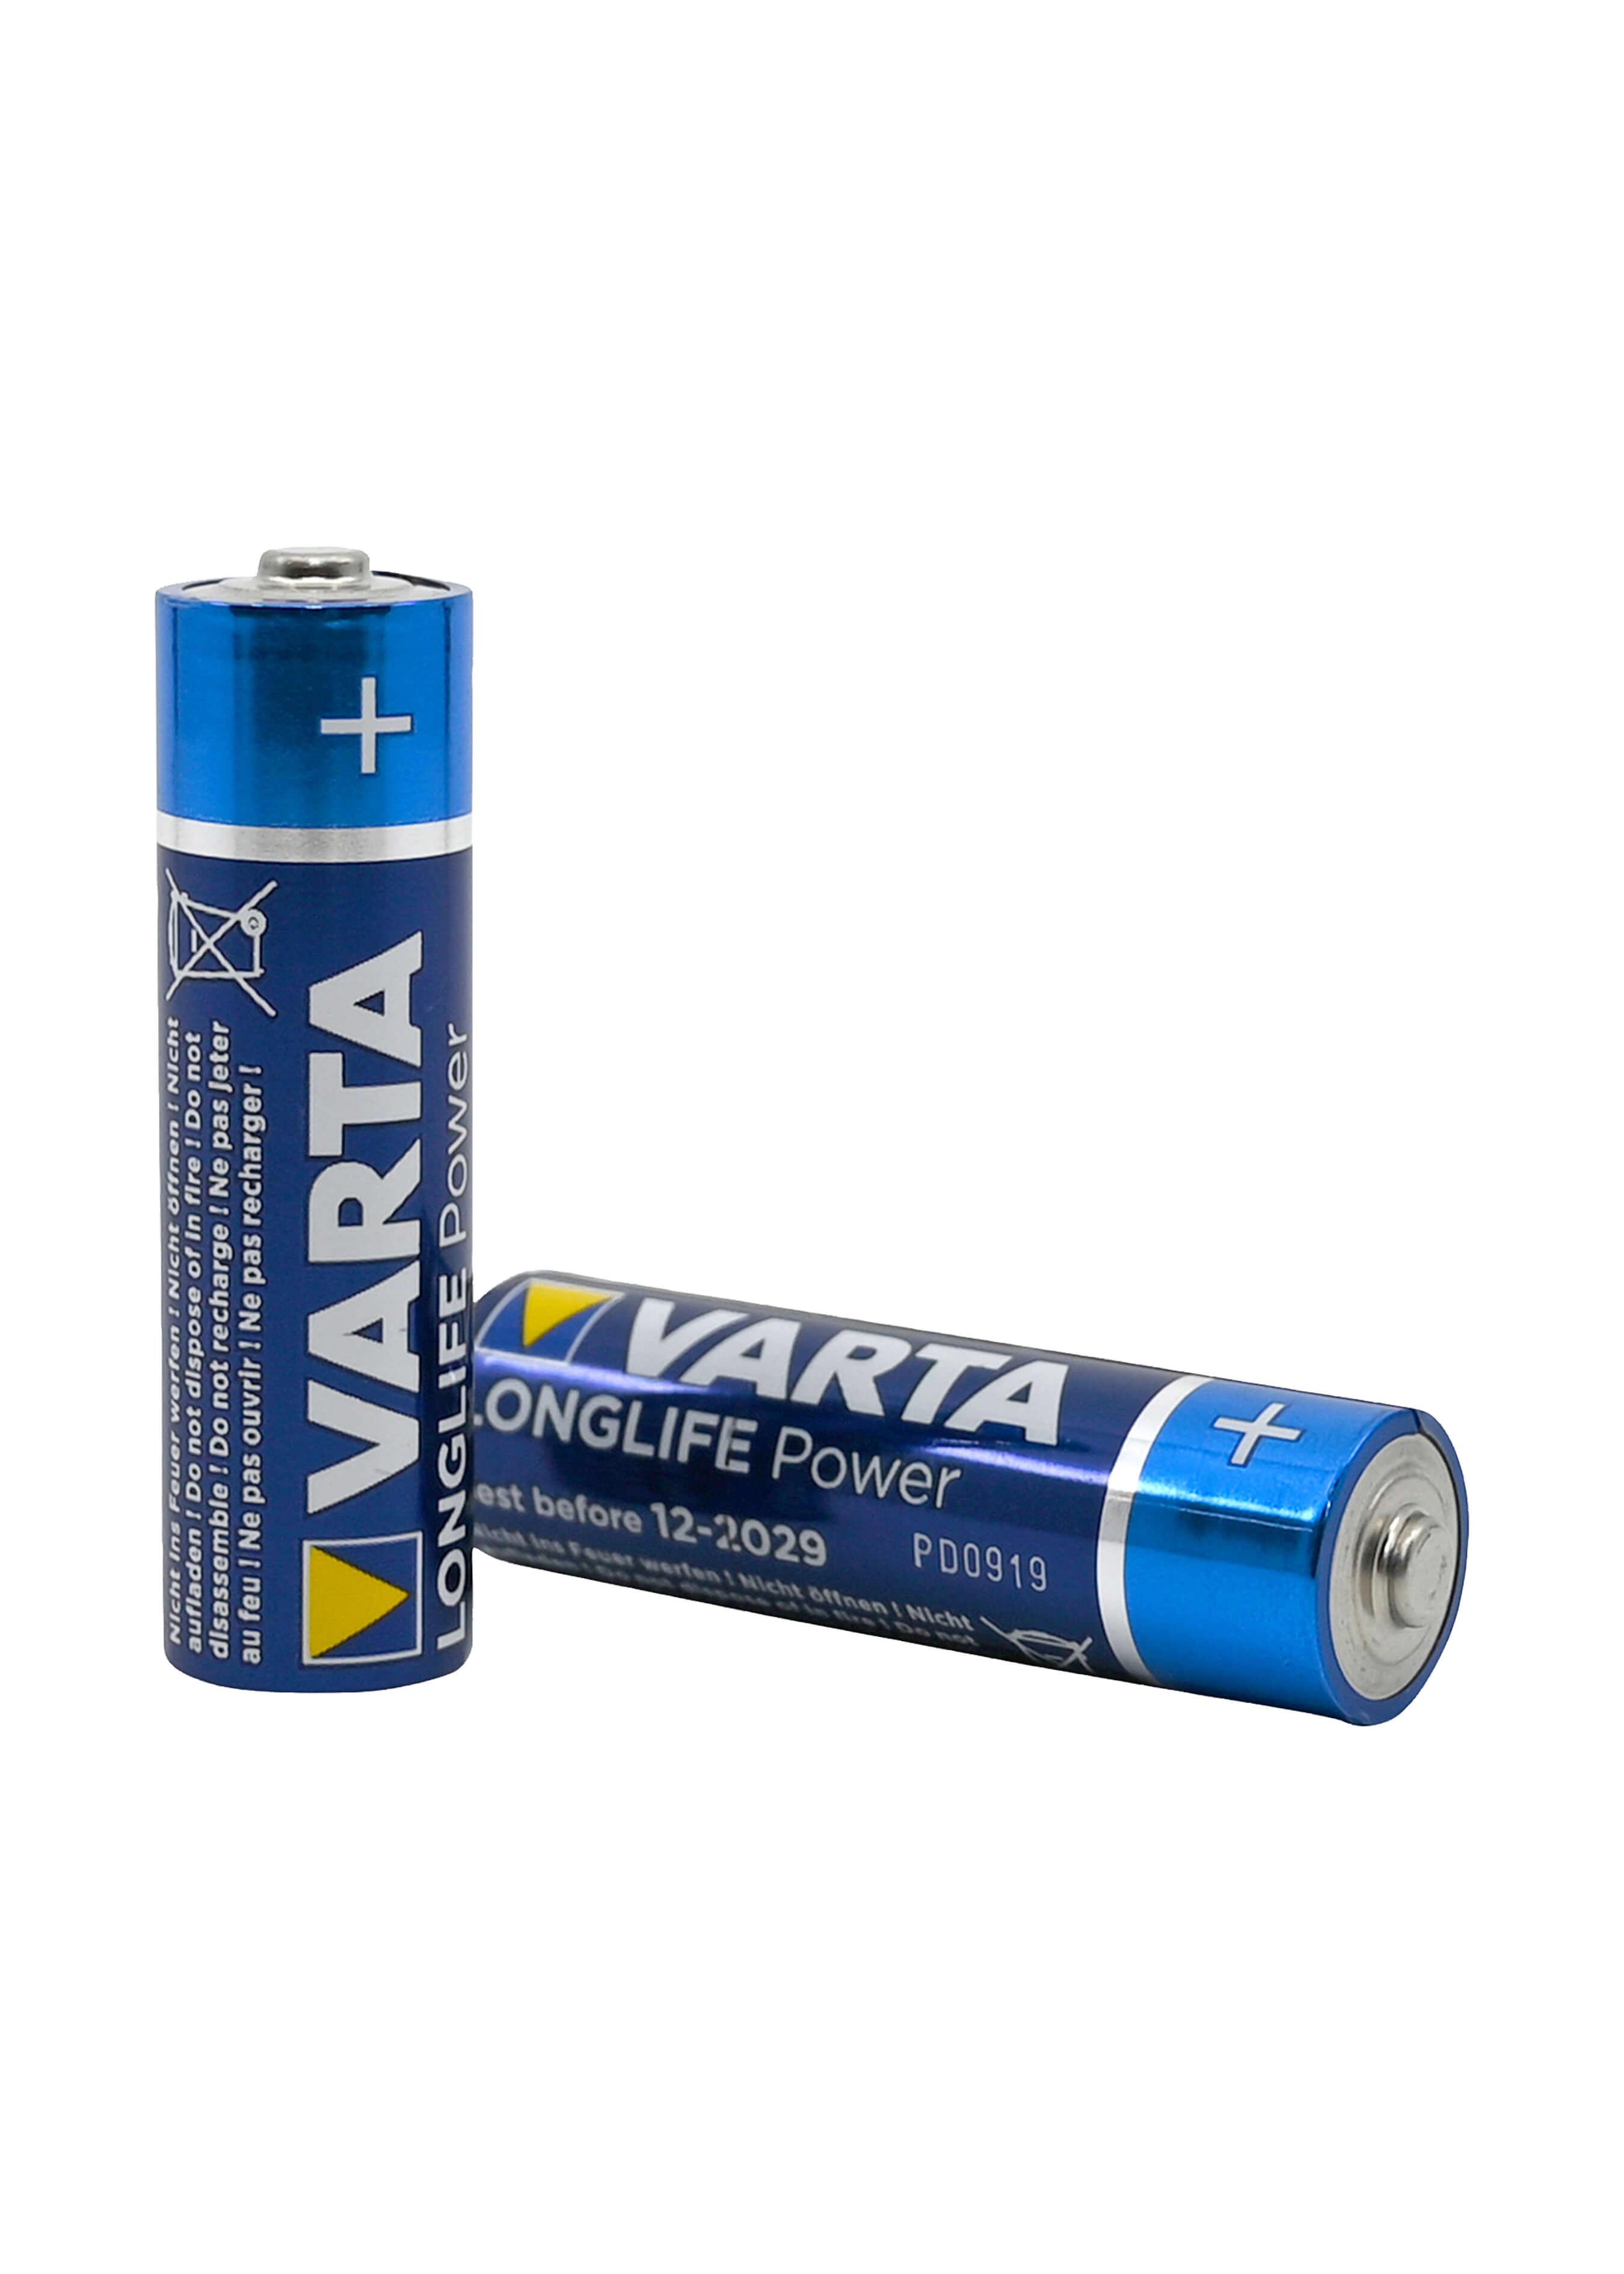 Varta 4 High Energy Batterien AA / LR06 L3582 2